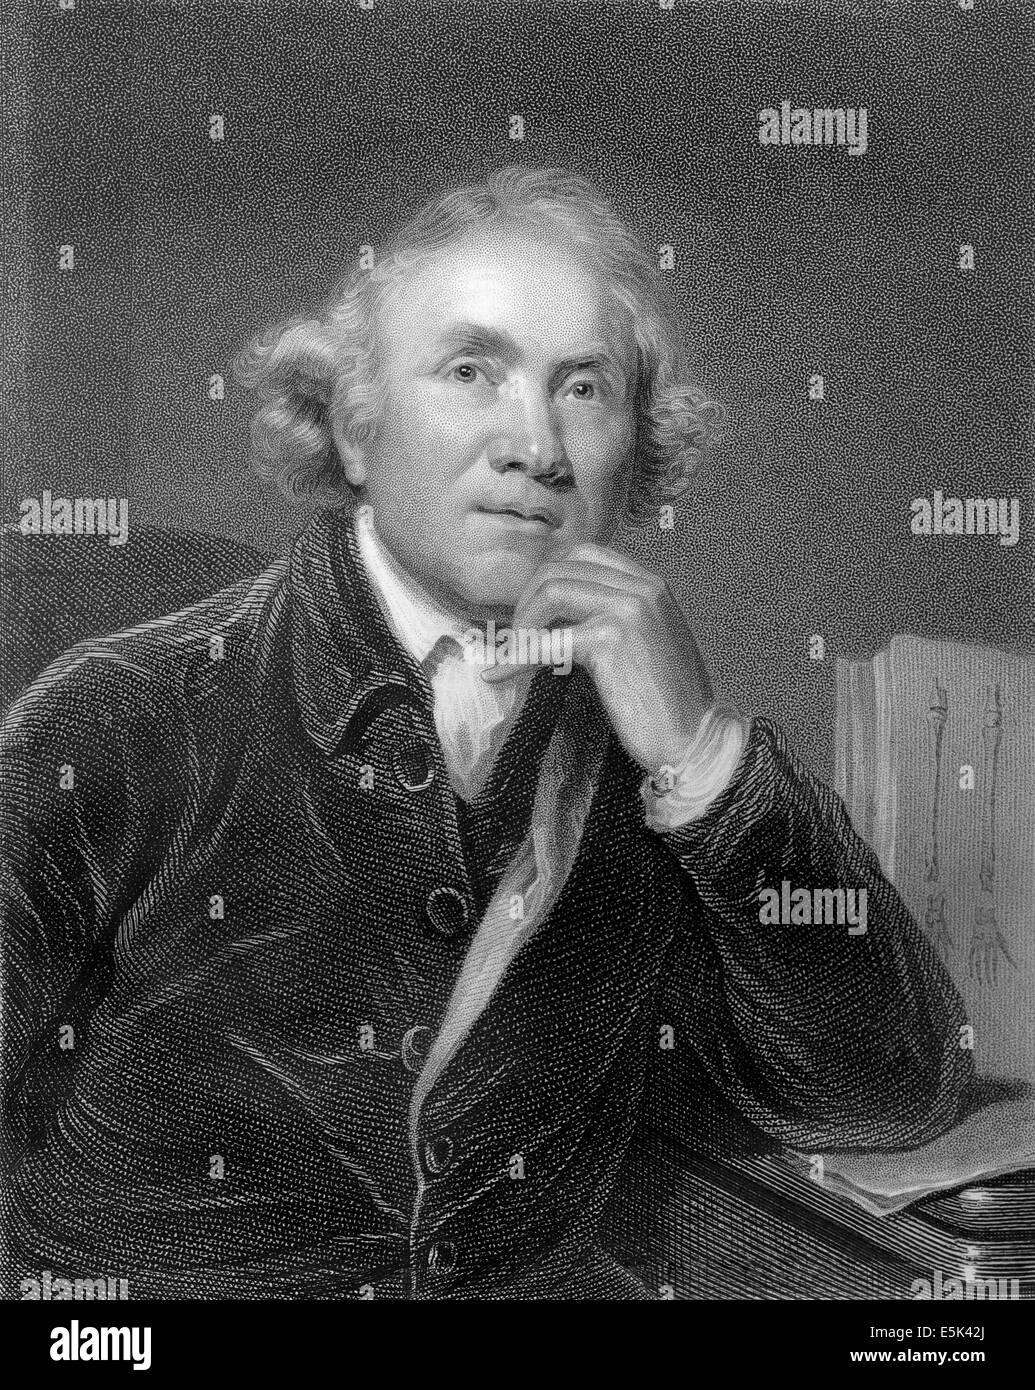 John Hunter, 1728-1793, a Scottish surgeon, - Stock Image